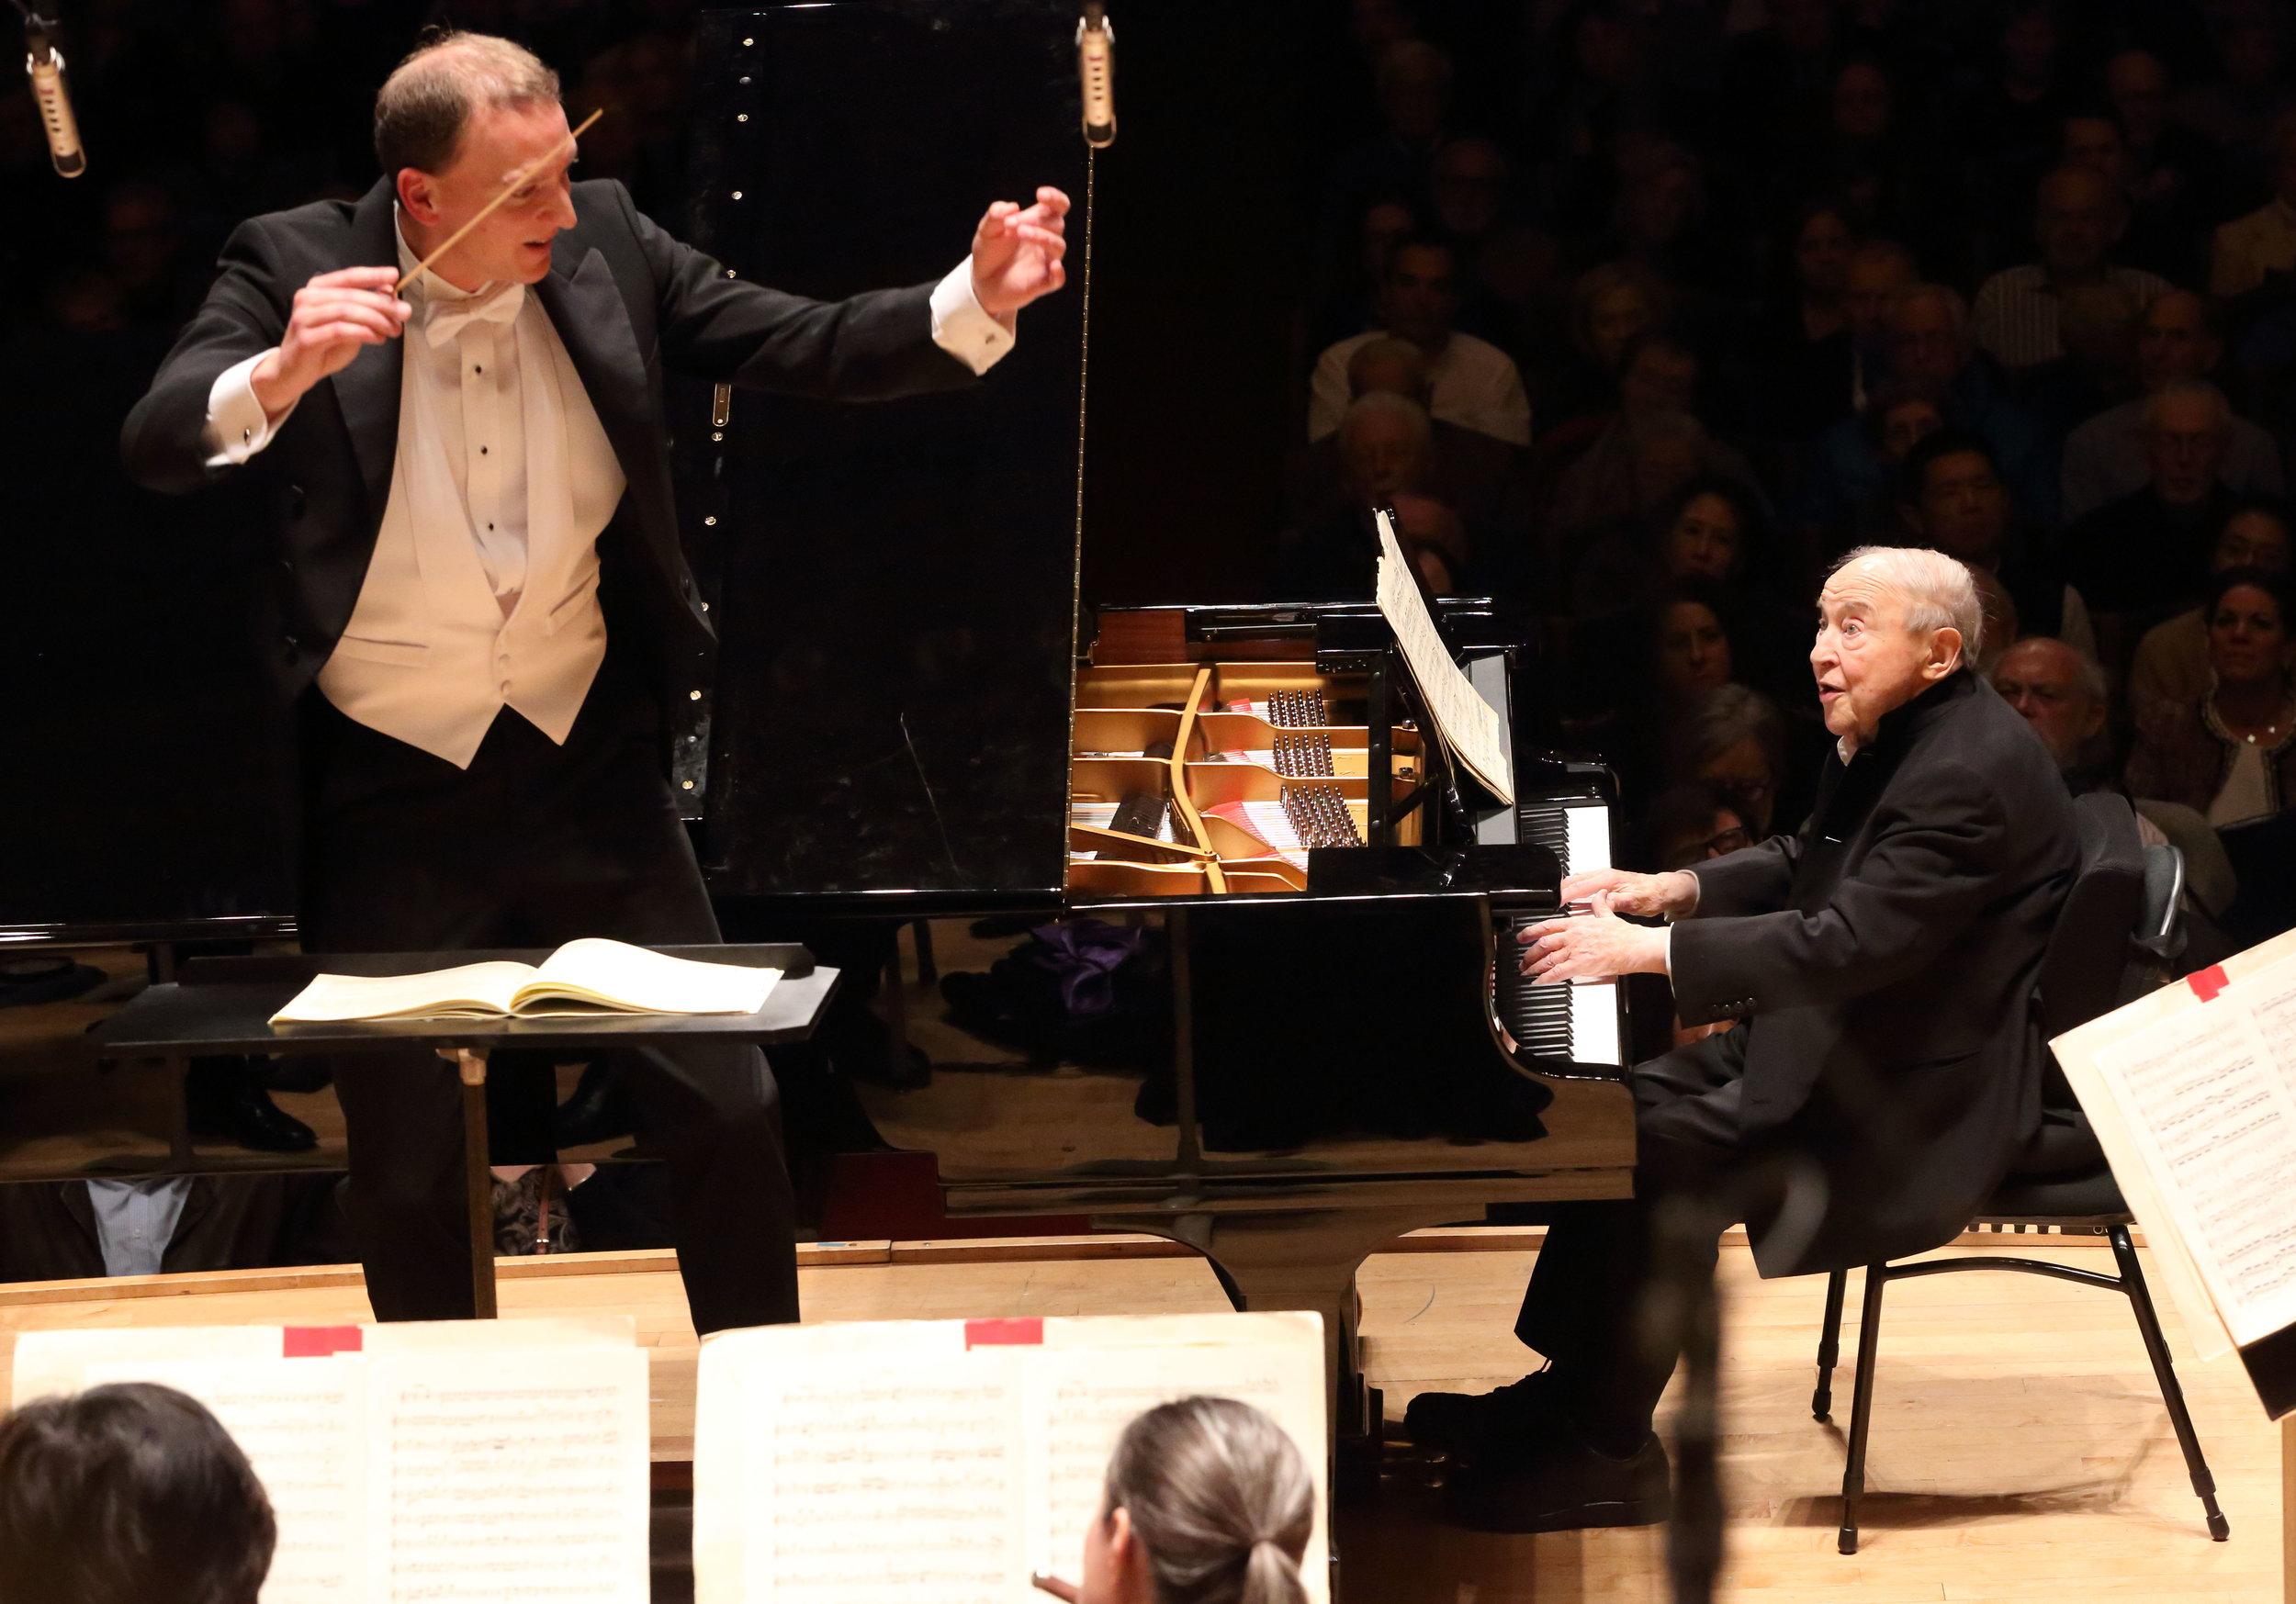 Moritz Gnann conducts the Boston Symphony Orchestra, with soloist Menahem Pressler, Nov. 22, 2016. Hilary Scott photograph.